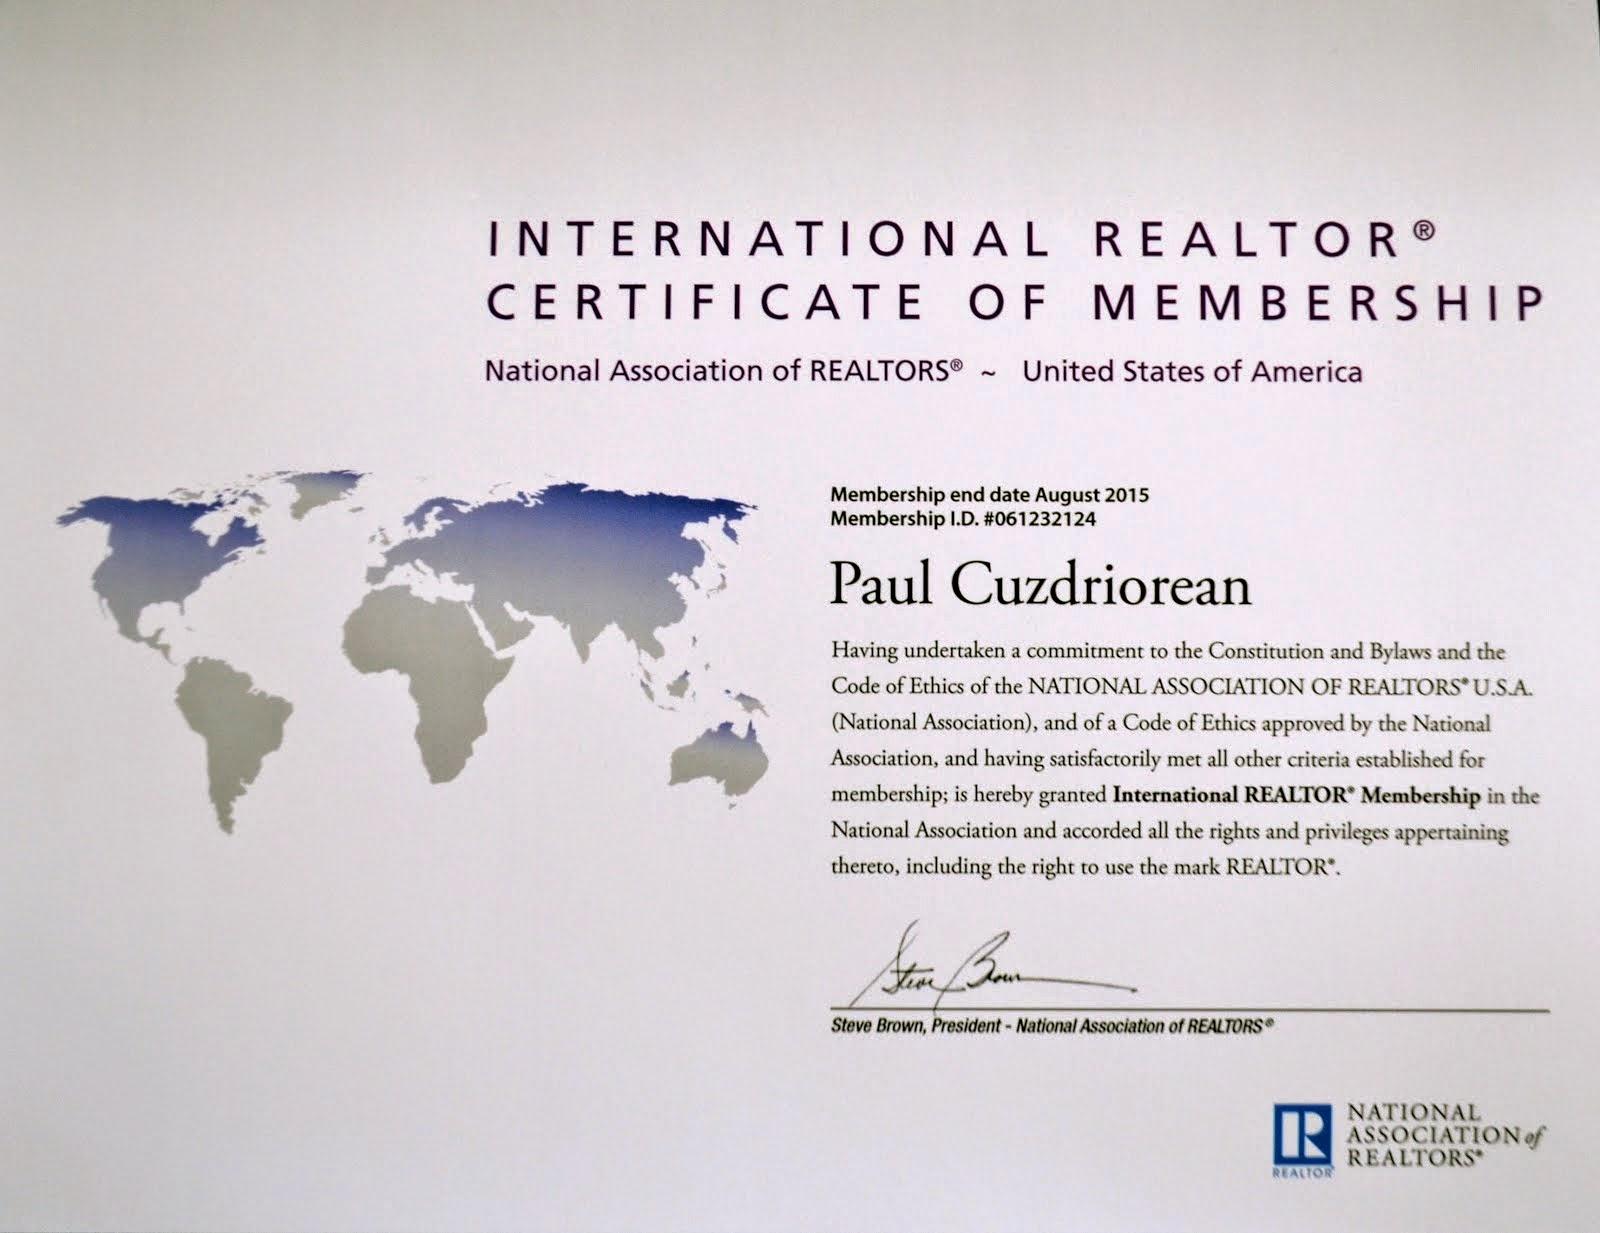 International REALTOR - Certificate of Membership